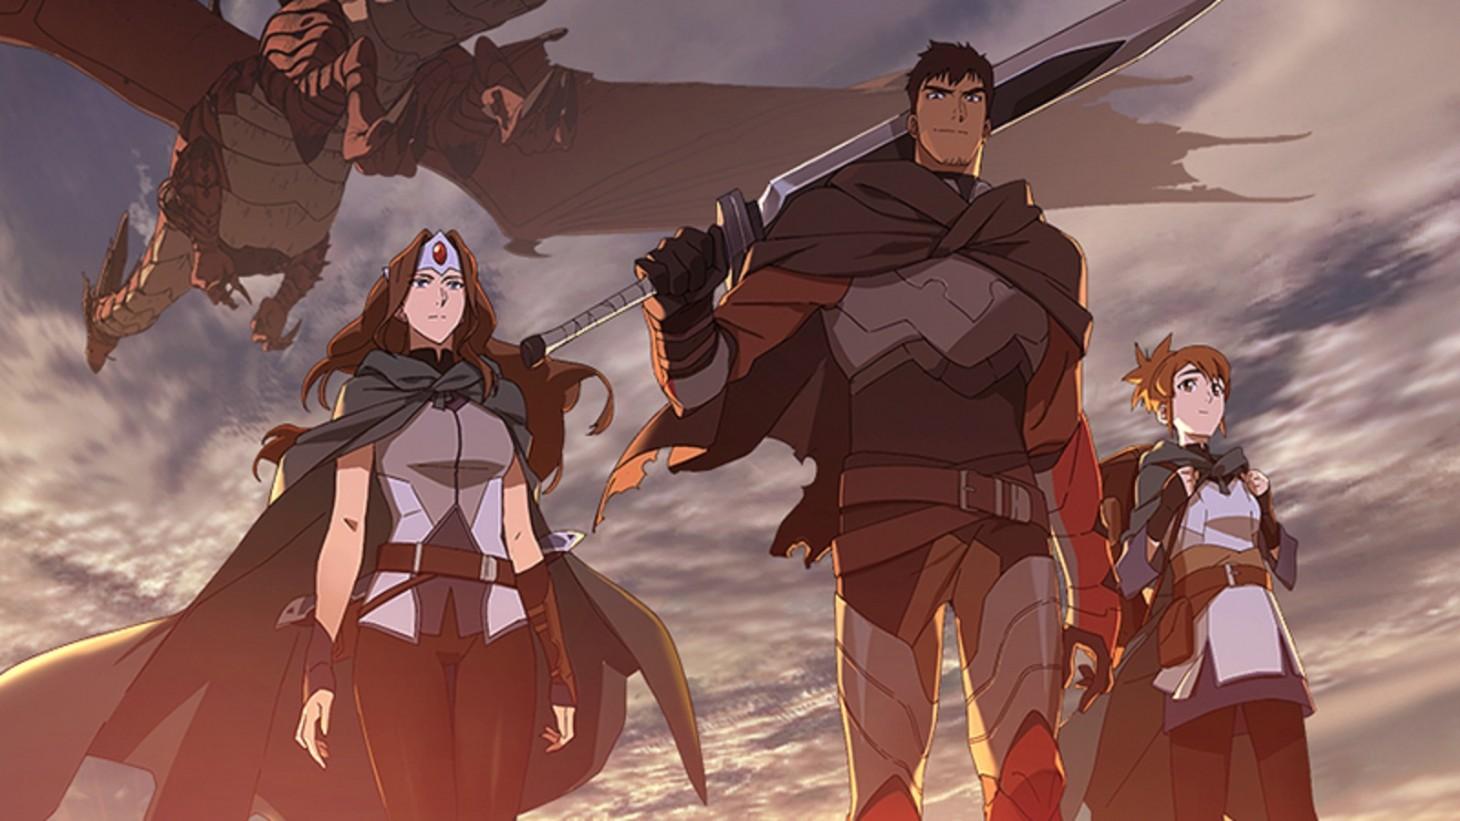 DOTA-Dragon's Blood release date